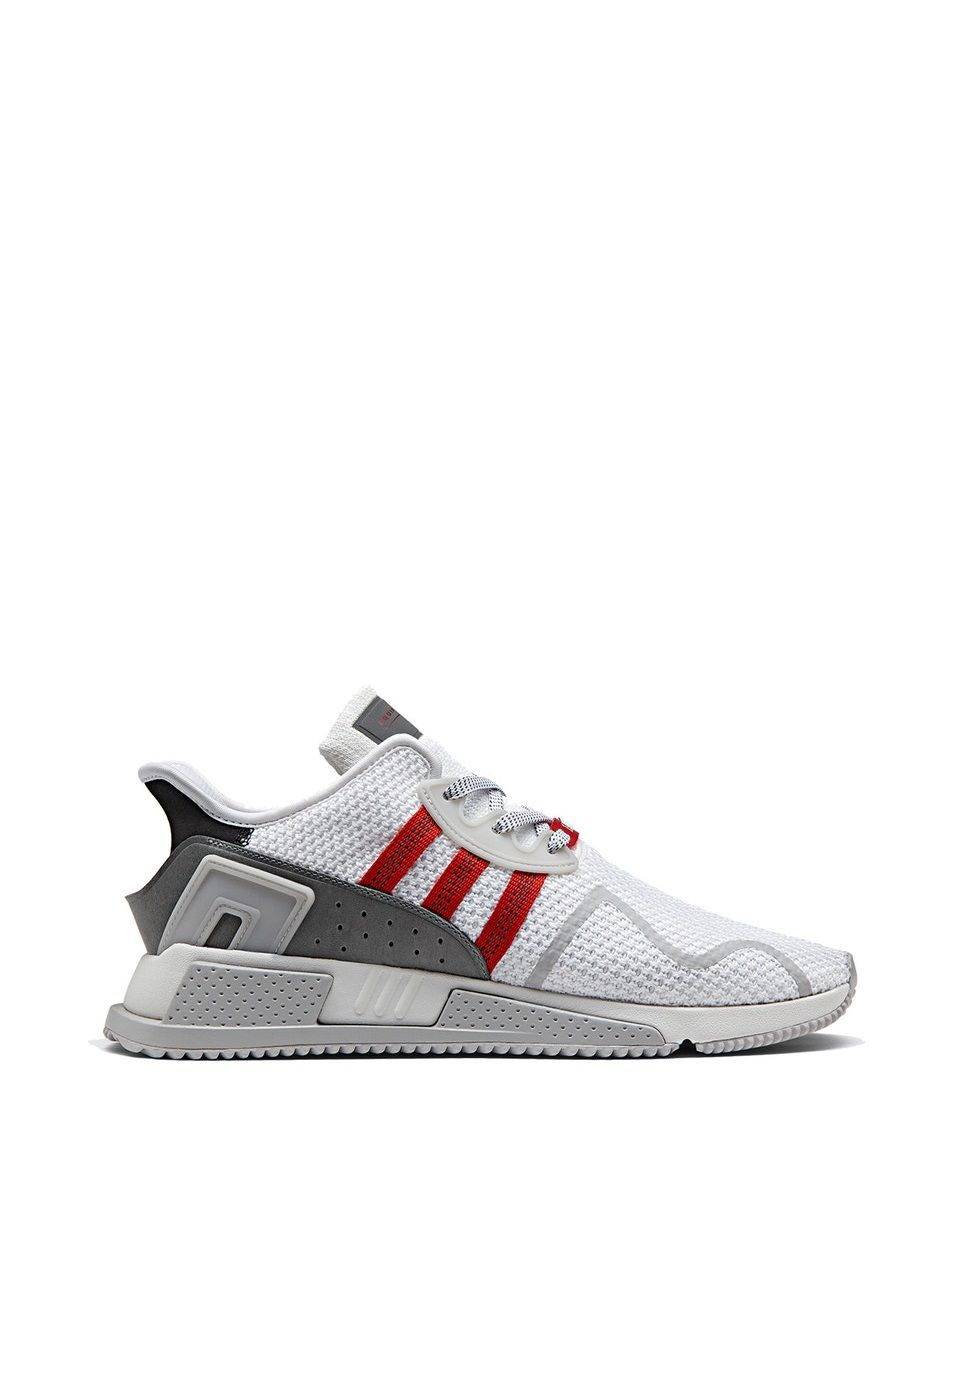 online store 28c7a 9190e adidas EQT Support ADV Adidasskor, Skor Sneakers, Nike Skor, Sneakers Mode,  Modealternativ